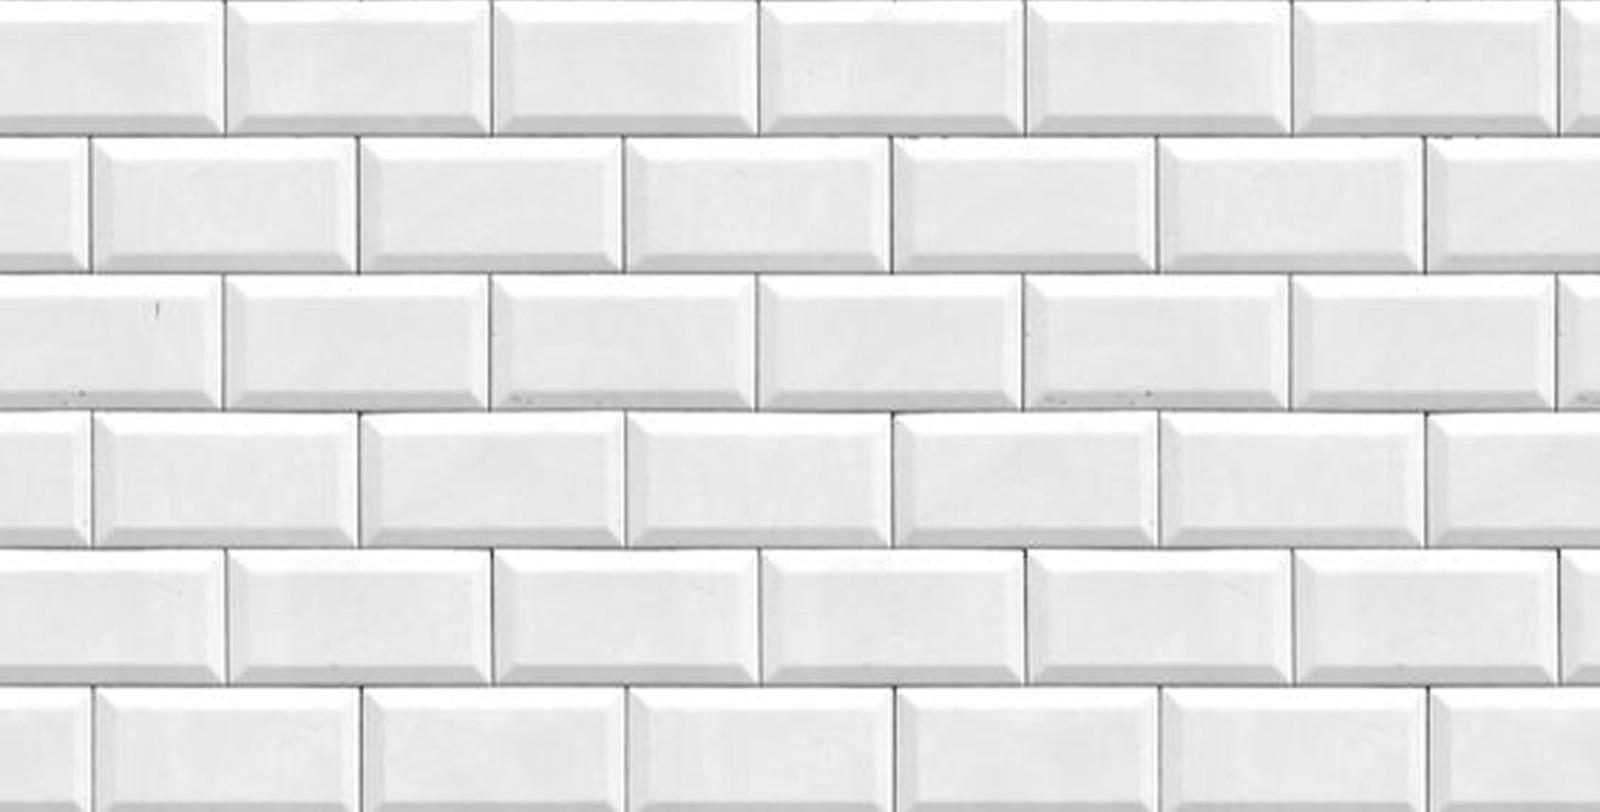 Piastrelle Bianche Diamantate Bagno le piastrelle in stile metropolitana - interior notes